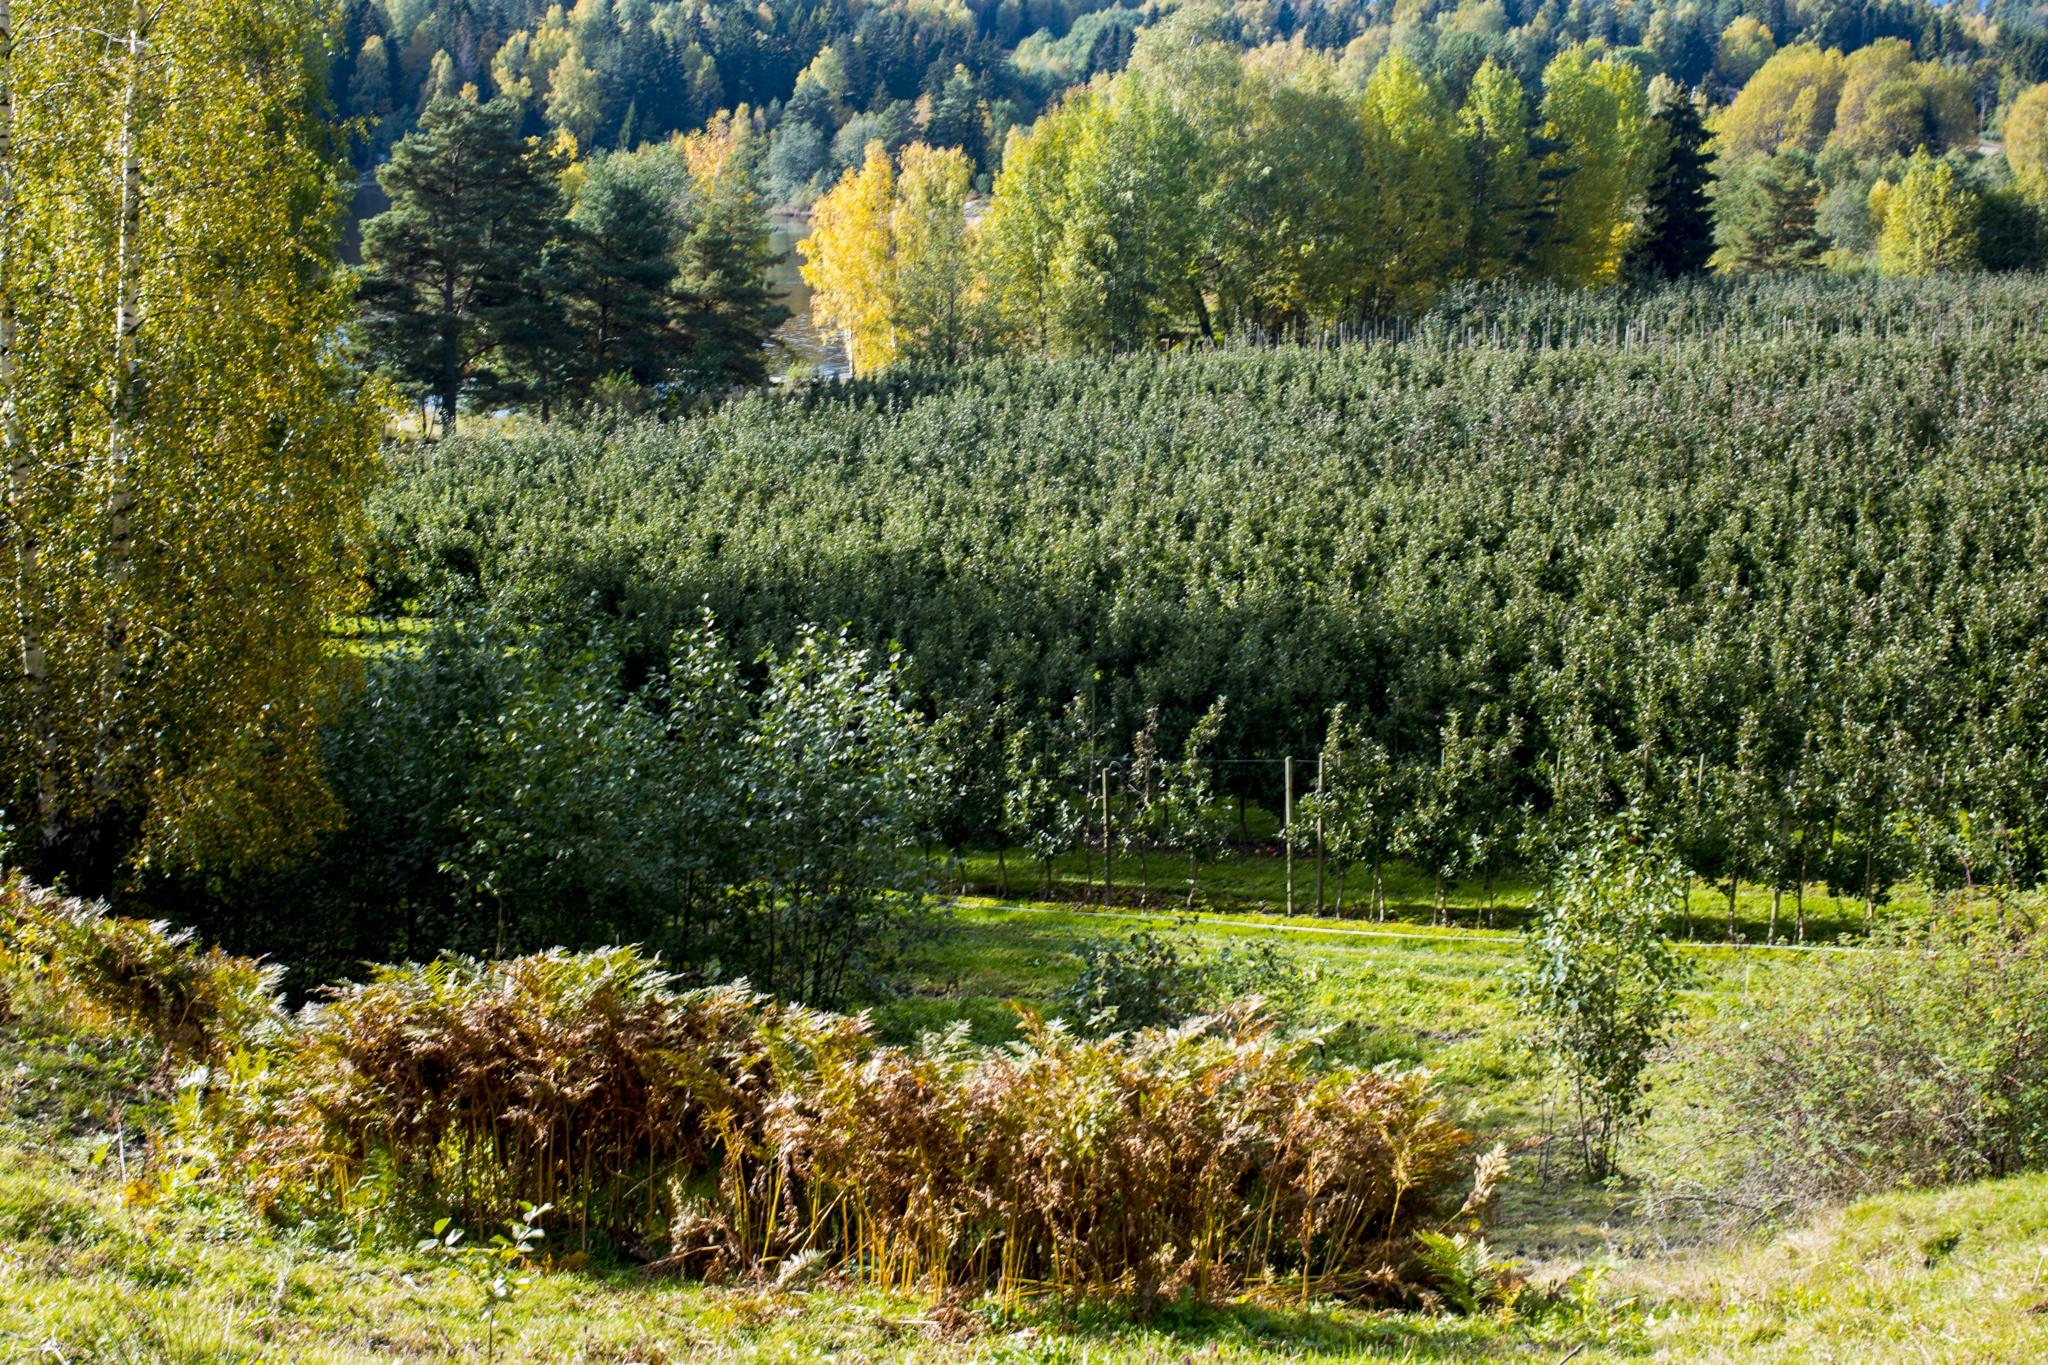 Apple Farm by Ole Morten Eyra